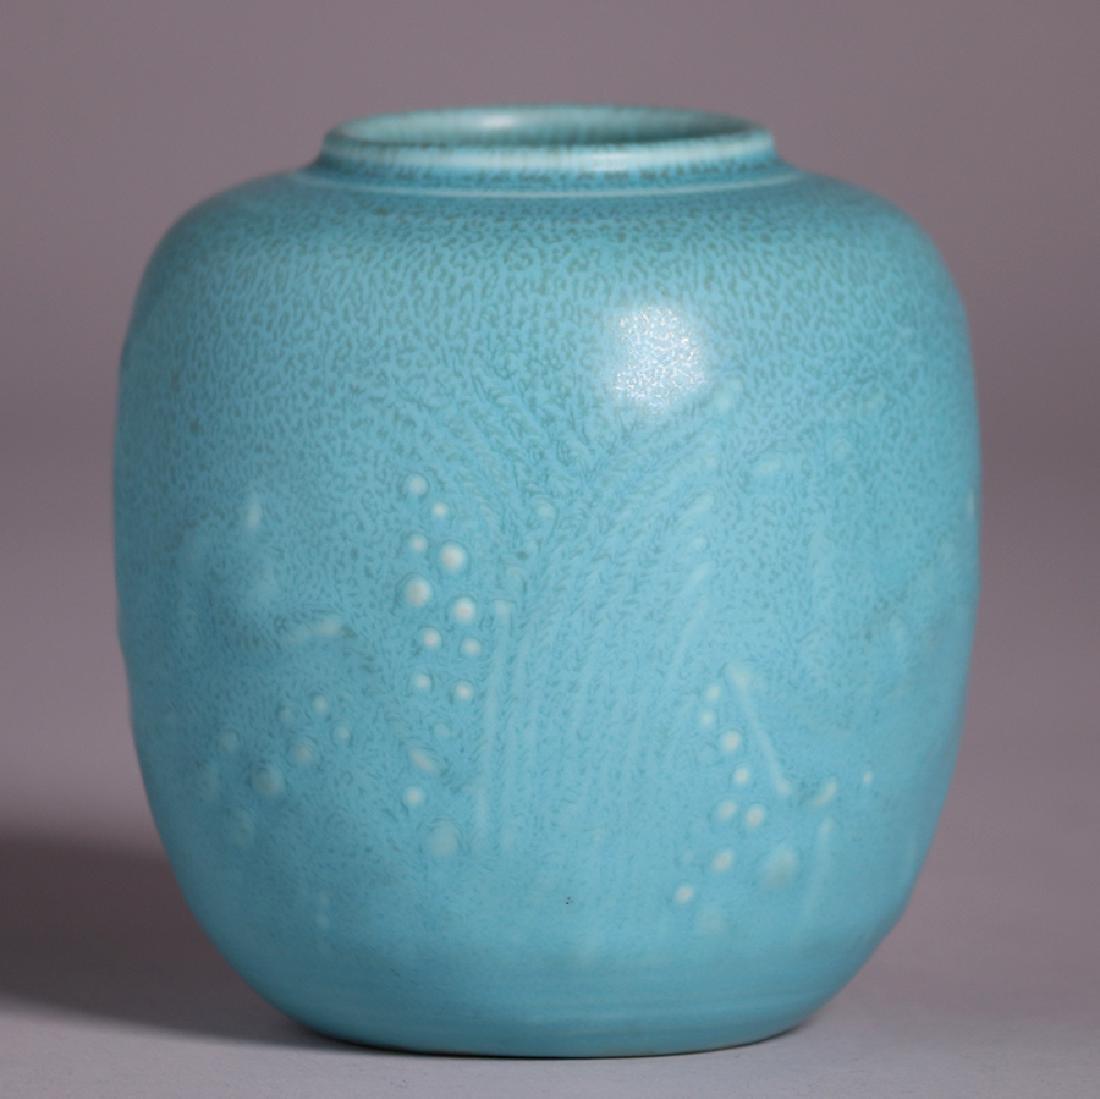 Rookwood Matte Turquoise Vase 1934